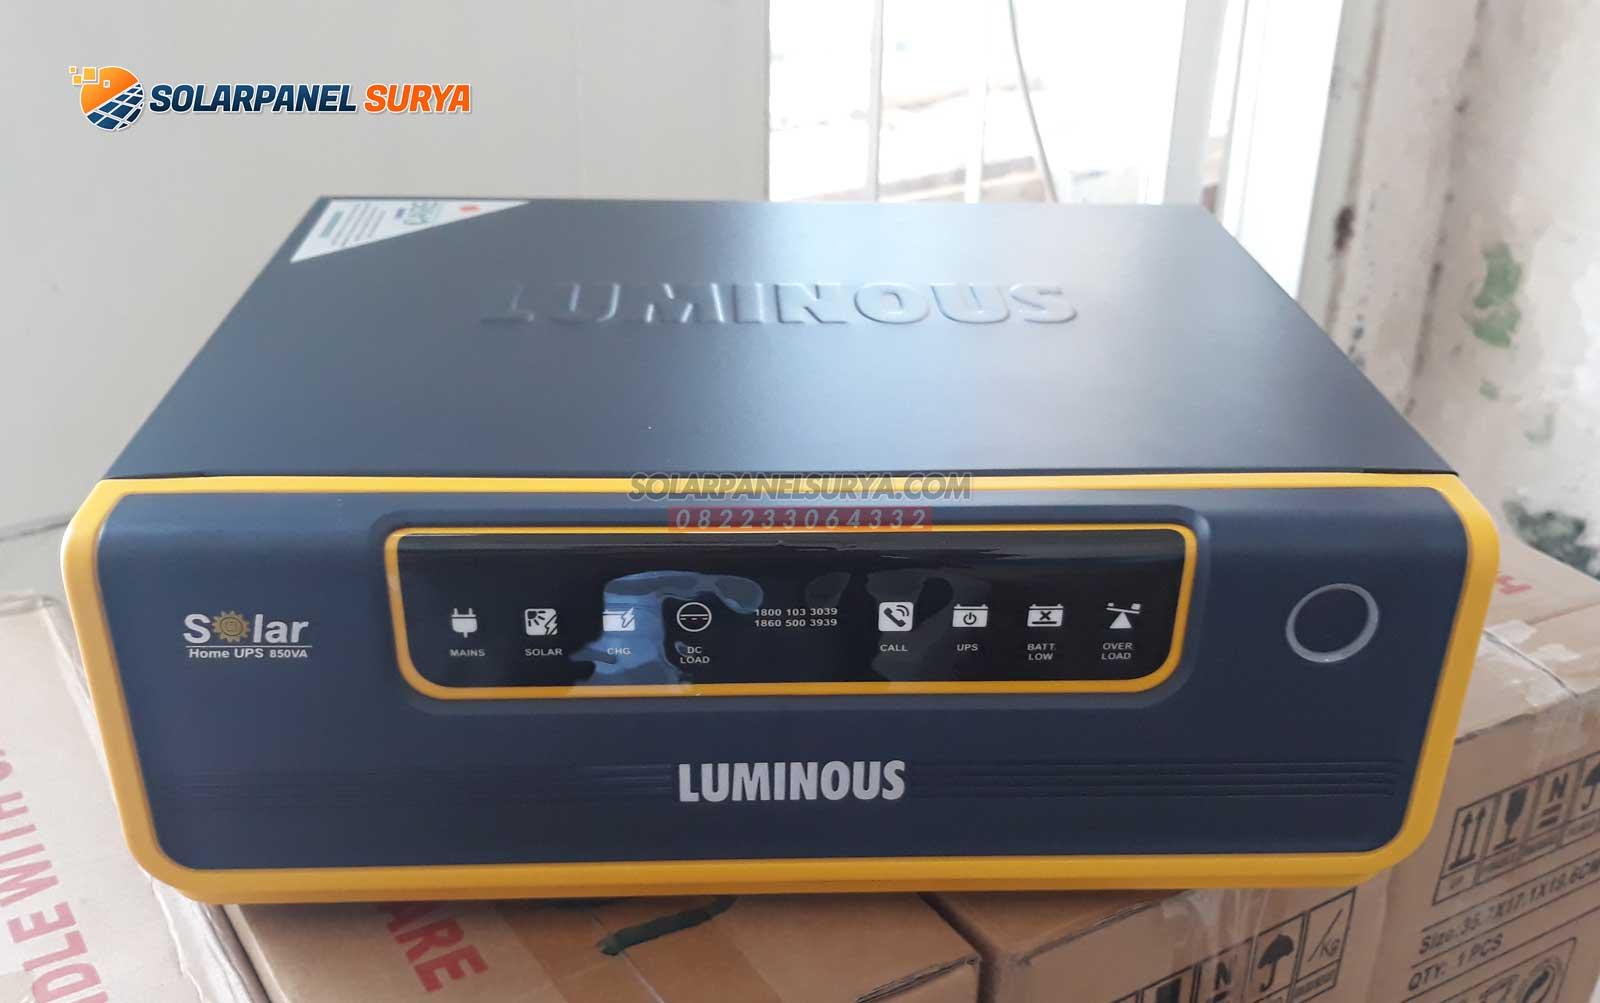 Inverter Luminous Solar Hybrid 850Va Pure Sine Wave